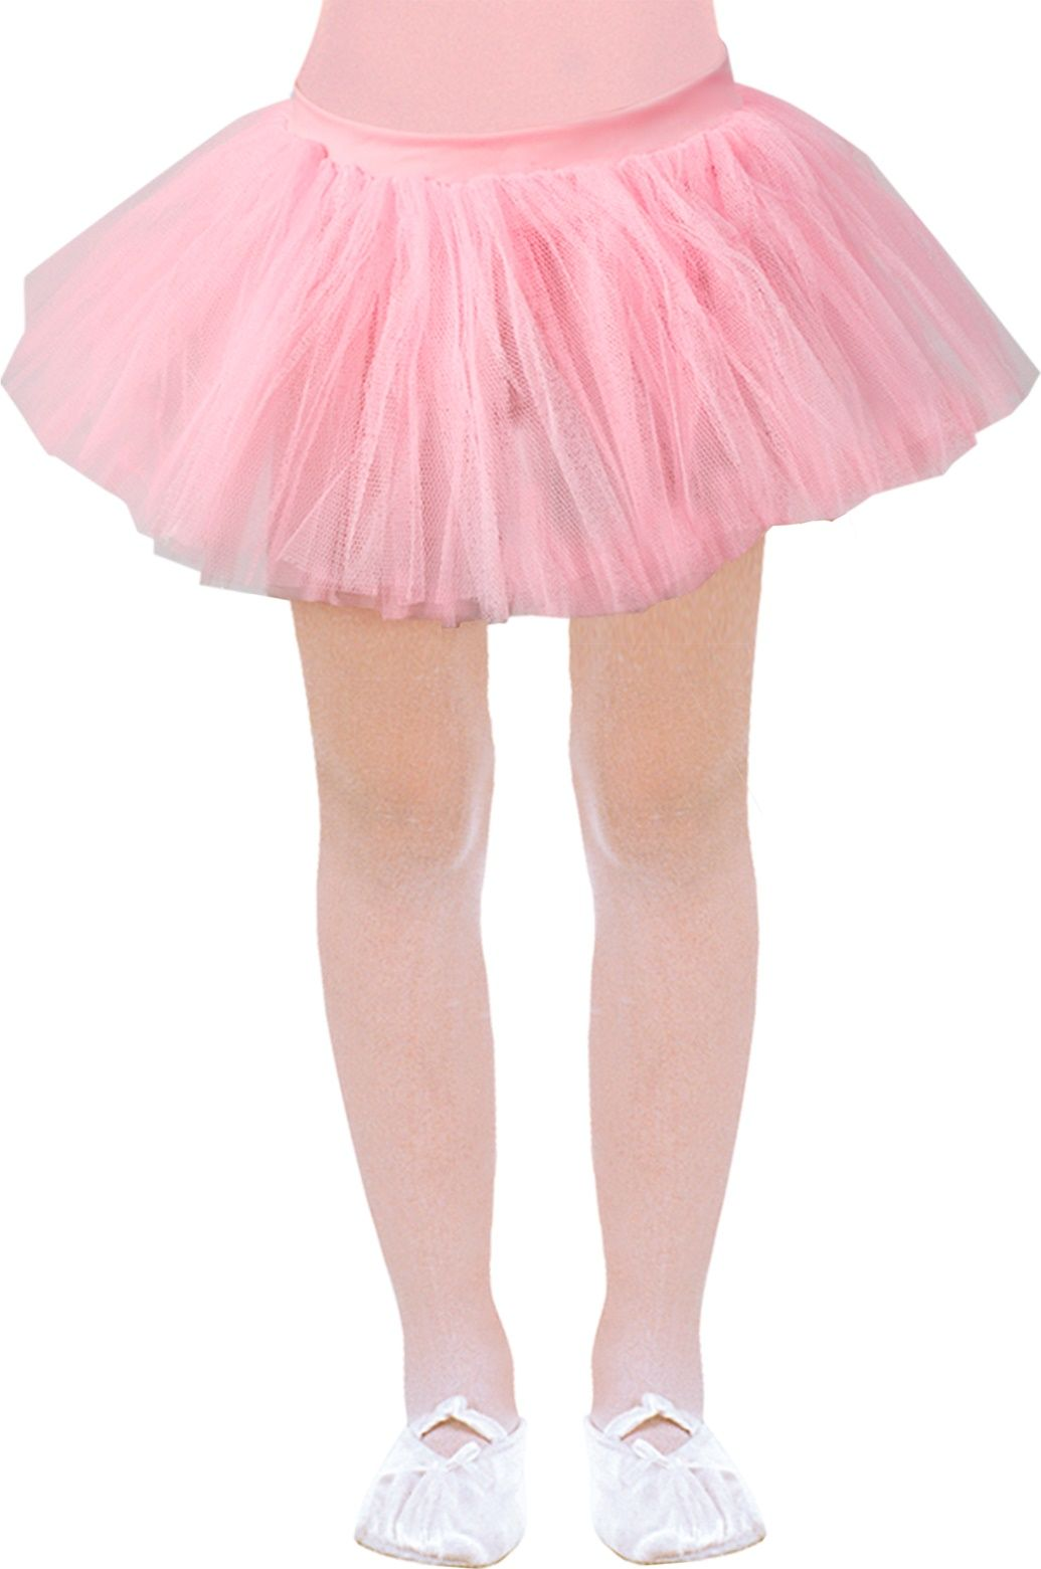 Roze ballerina rokje